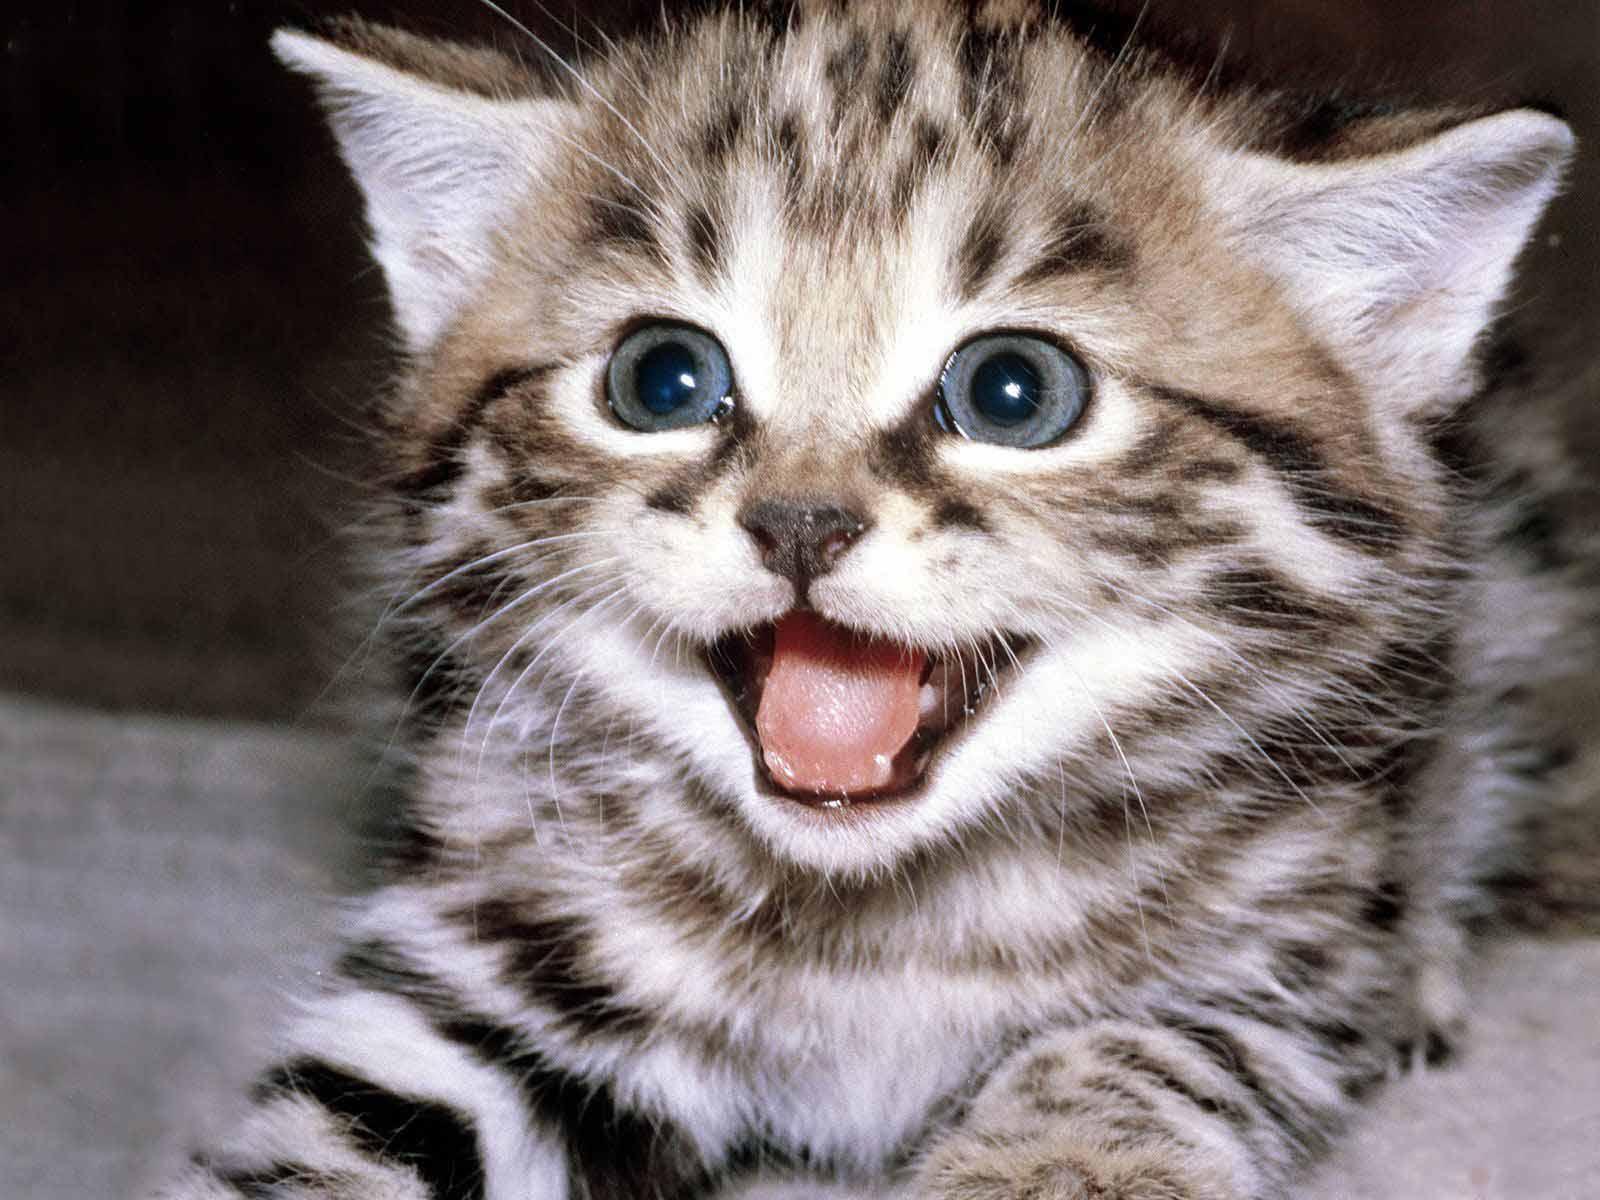 gambar kucing - gambar kucing yang lucu